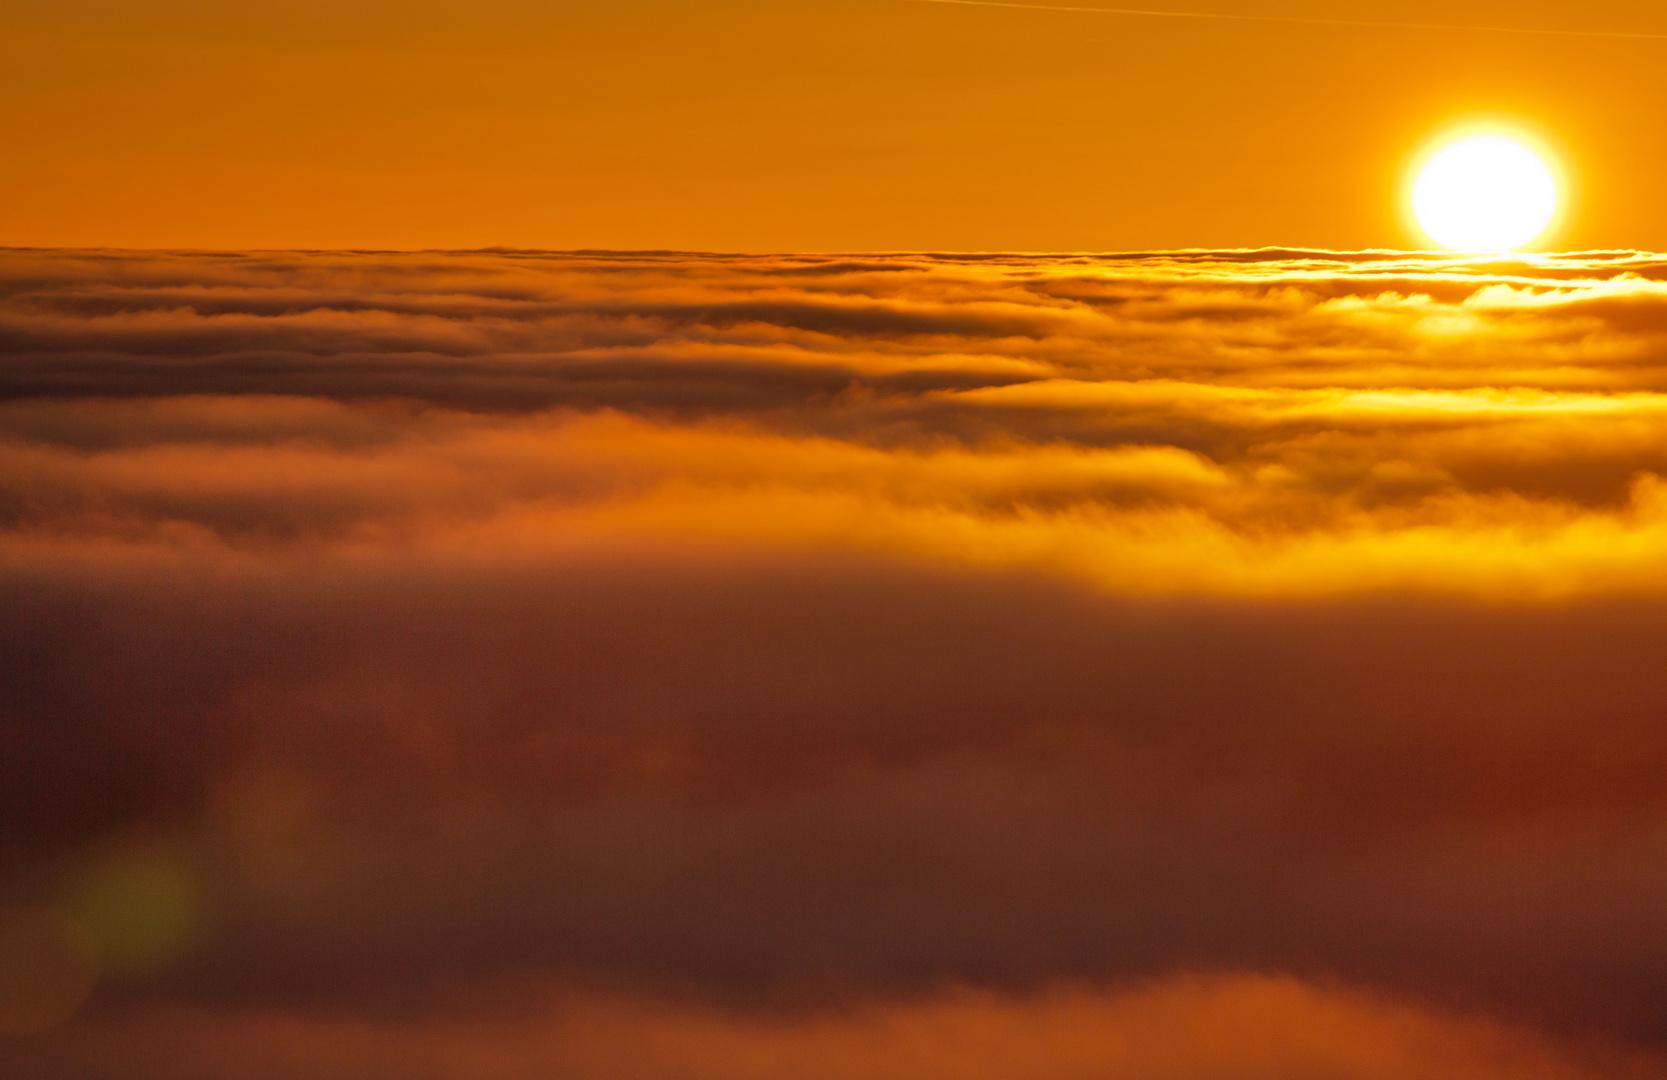 ***28.02.13 Sonnenuntergang auf dem Keilberg***